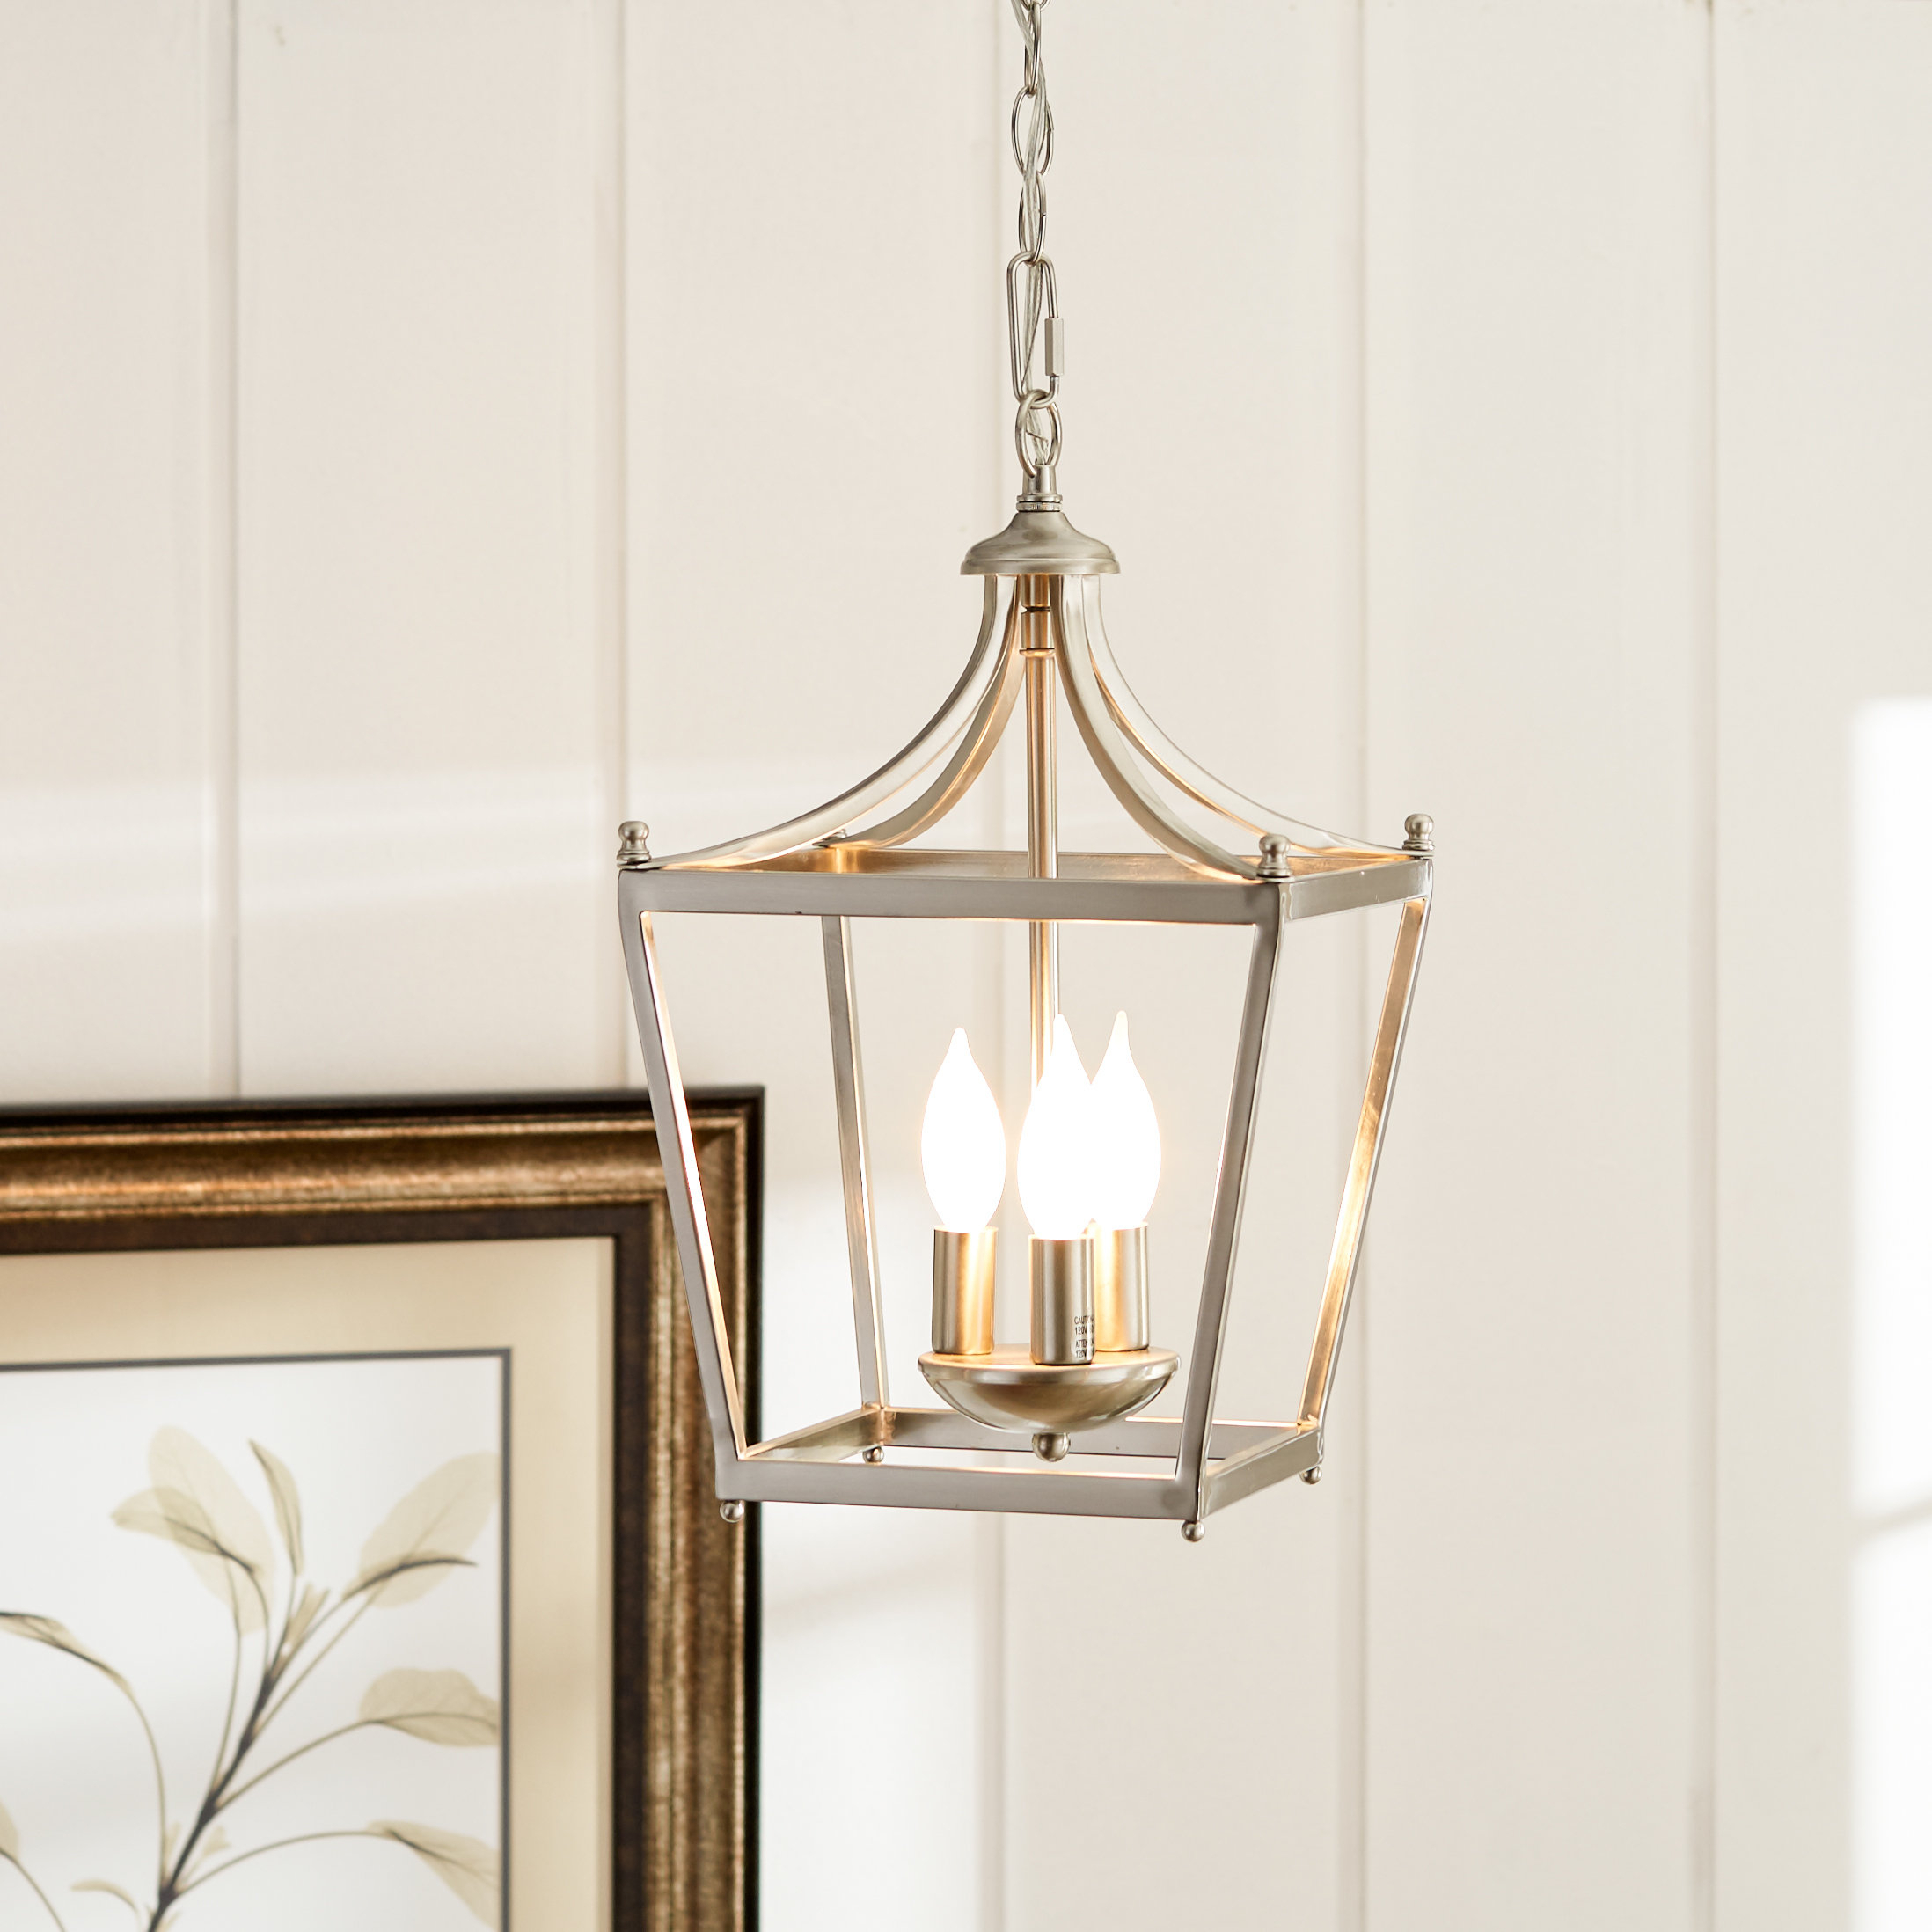 Birch Lane™ Heritage Gabriella 3 Light Lantern Chandelier Throughout Gabriella 3 Light Lantern Chandeliers (View 2 of 30)